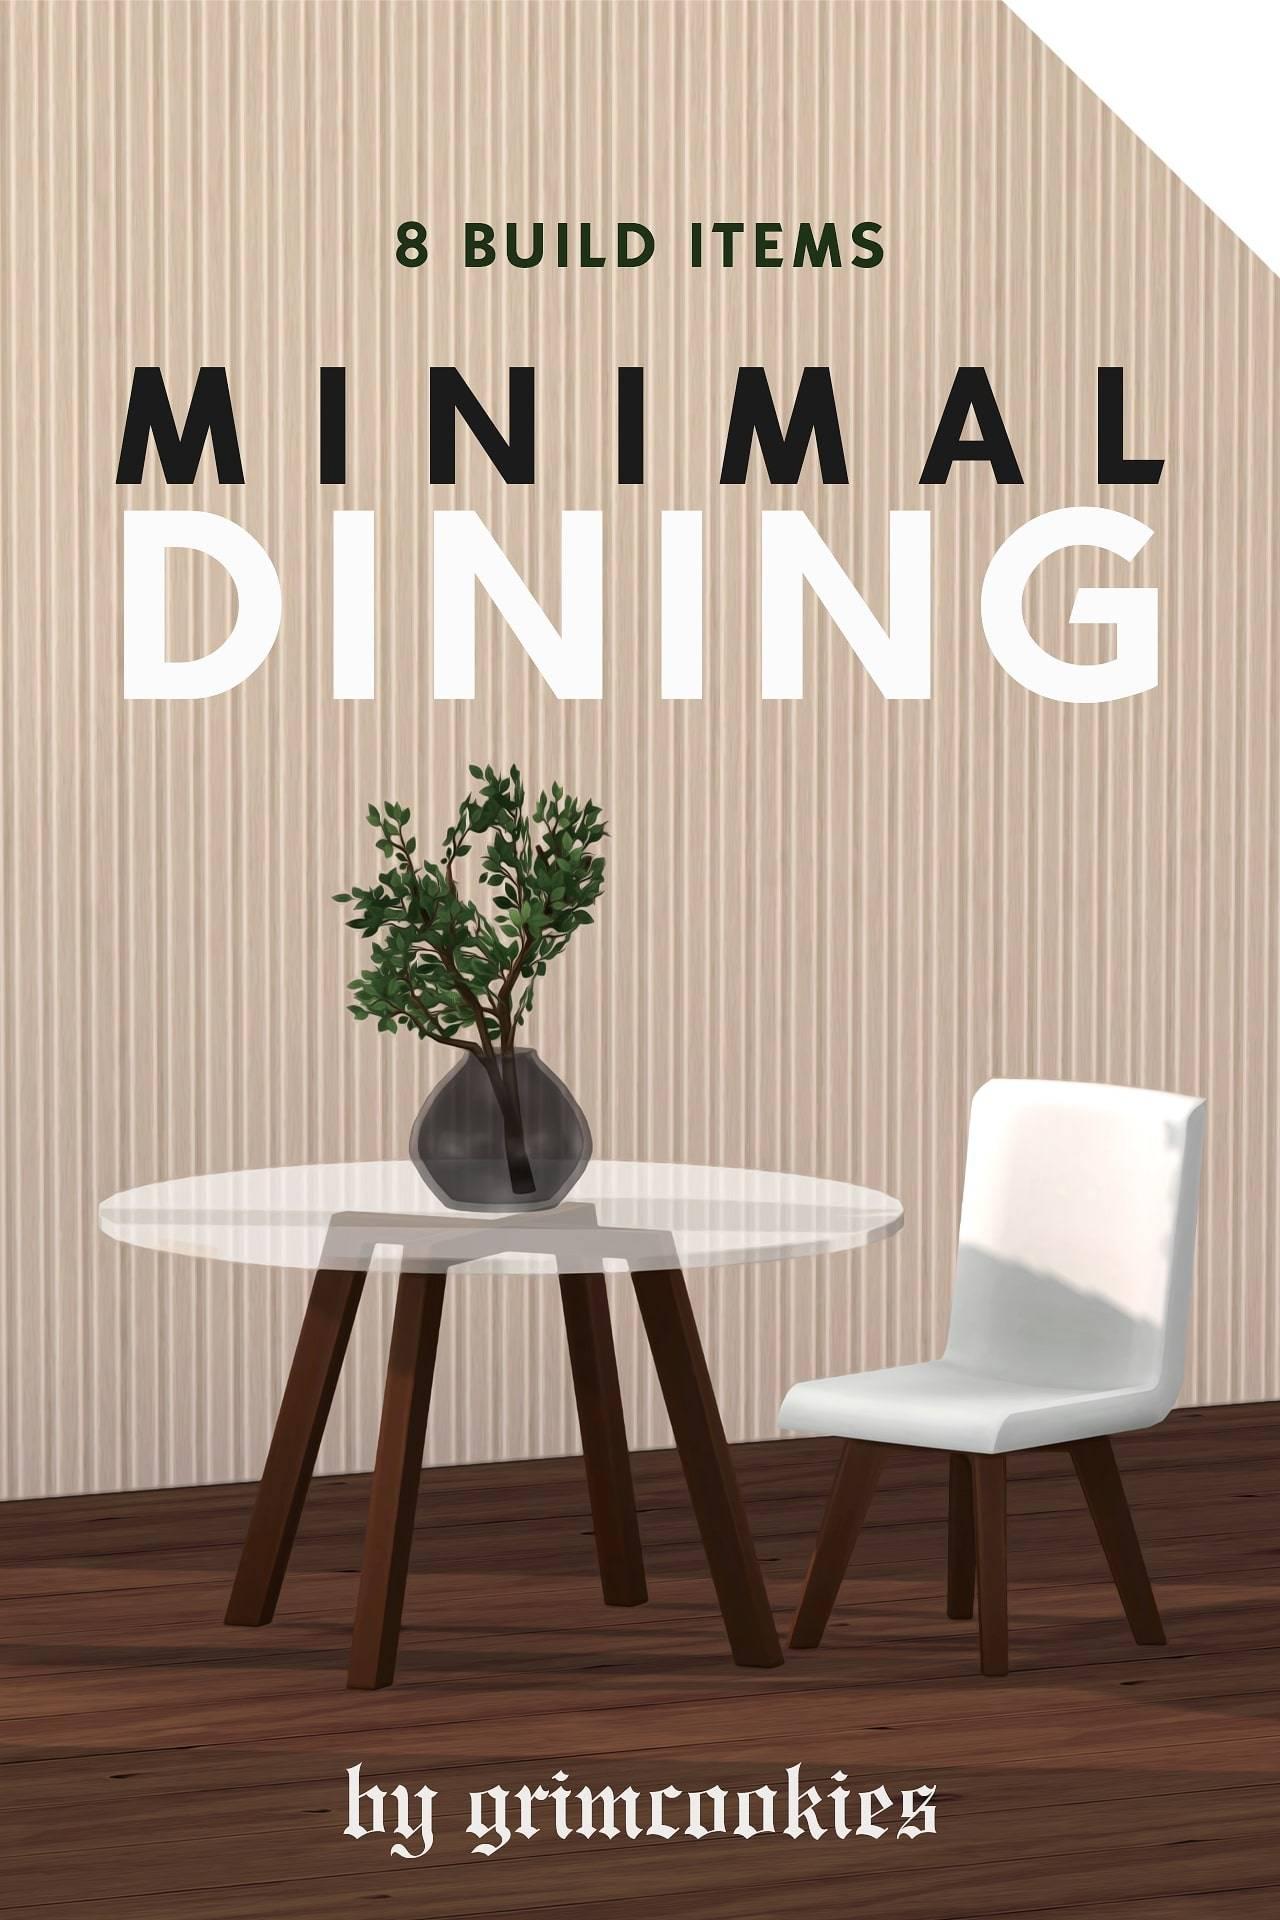 Столовая - Minimal Dining